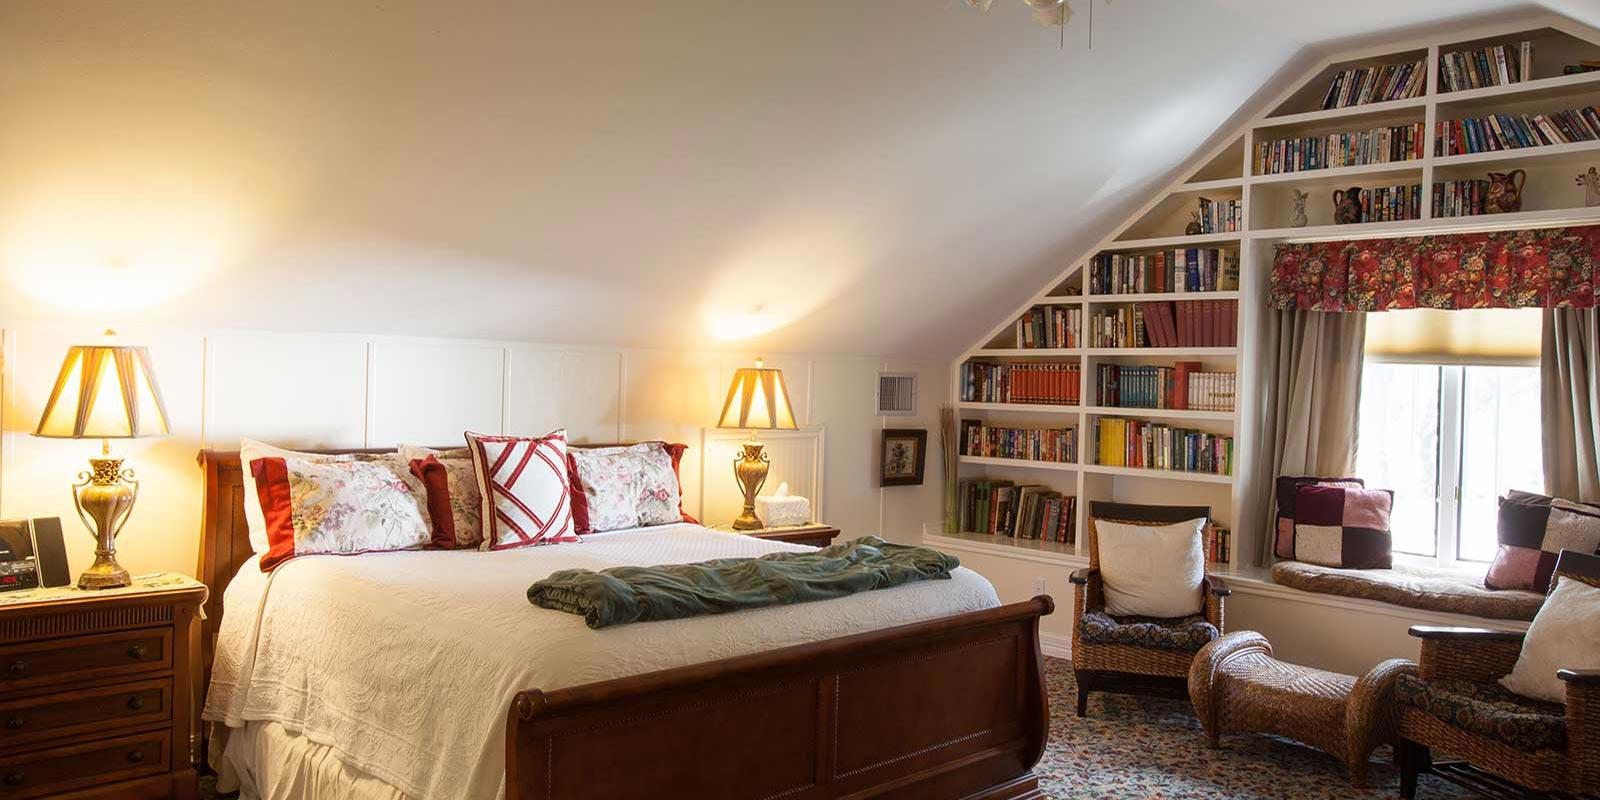 Bed And Breakfast Fredericksburg Tx